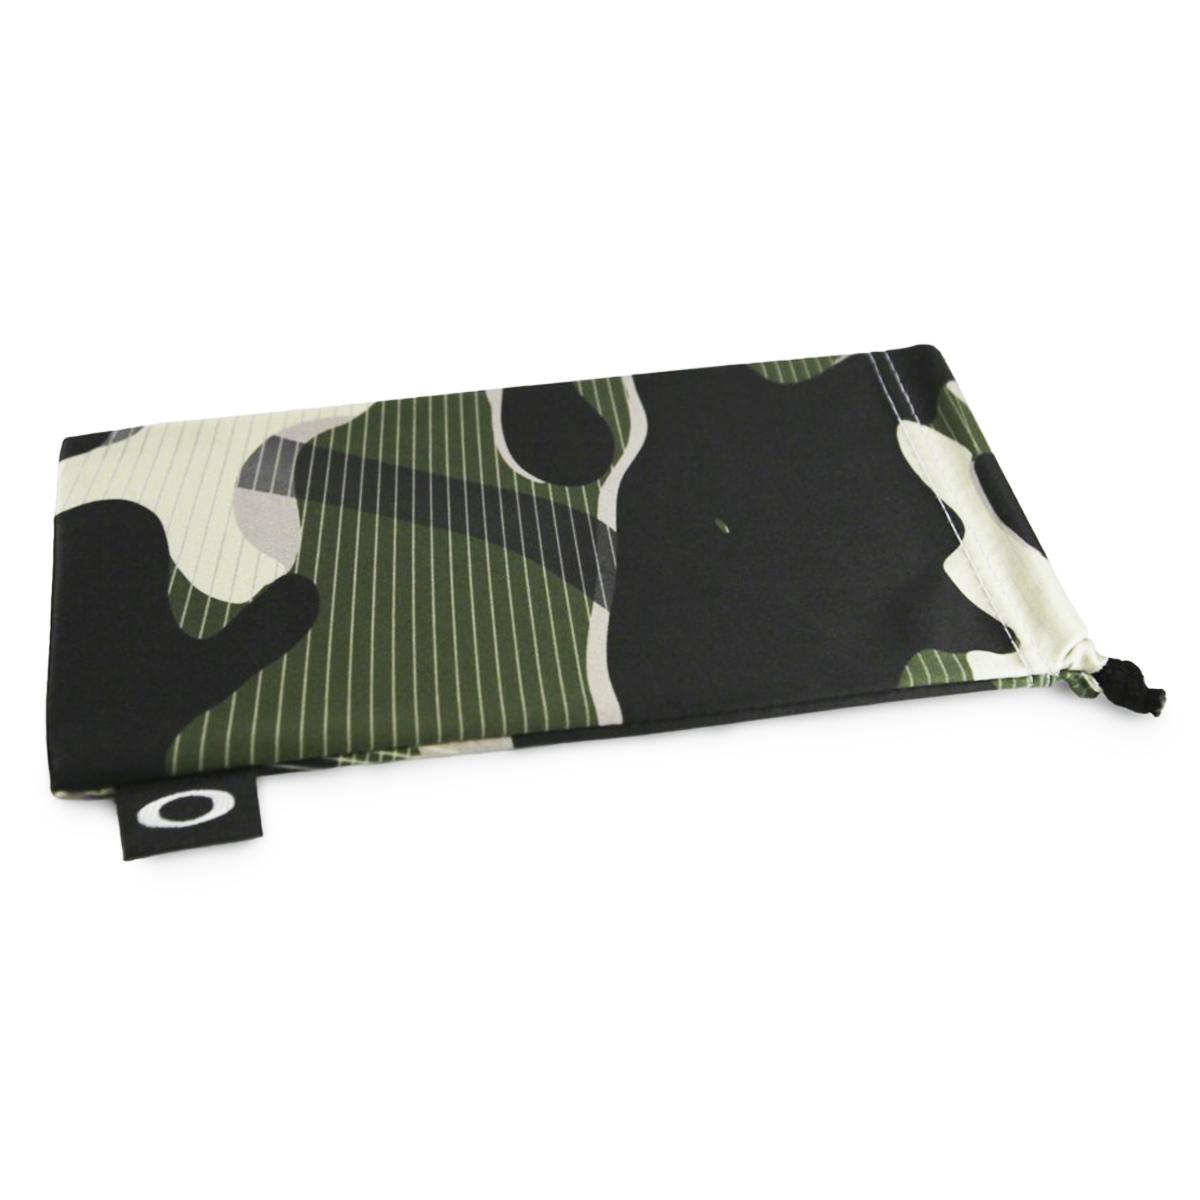 Microbag Oakley Camuflada Green ref  102-151-001 0cbdb7f71a